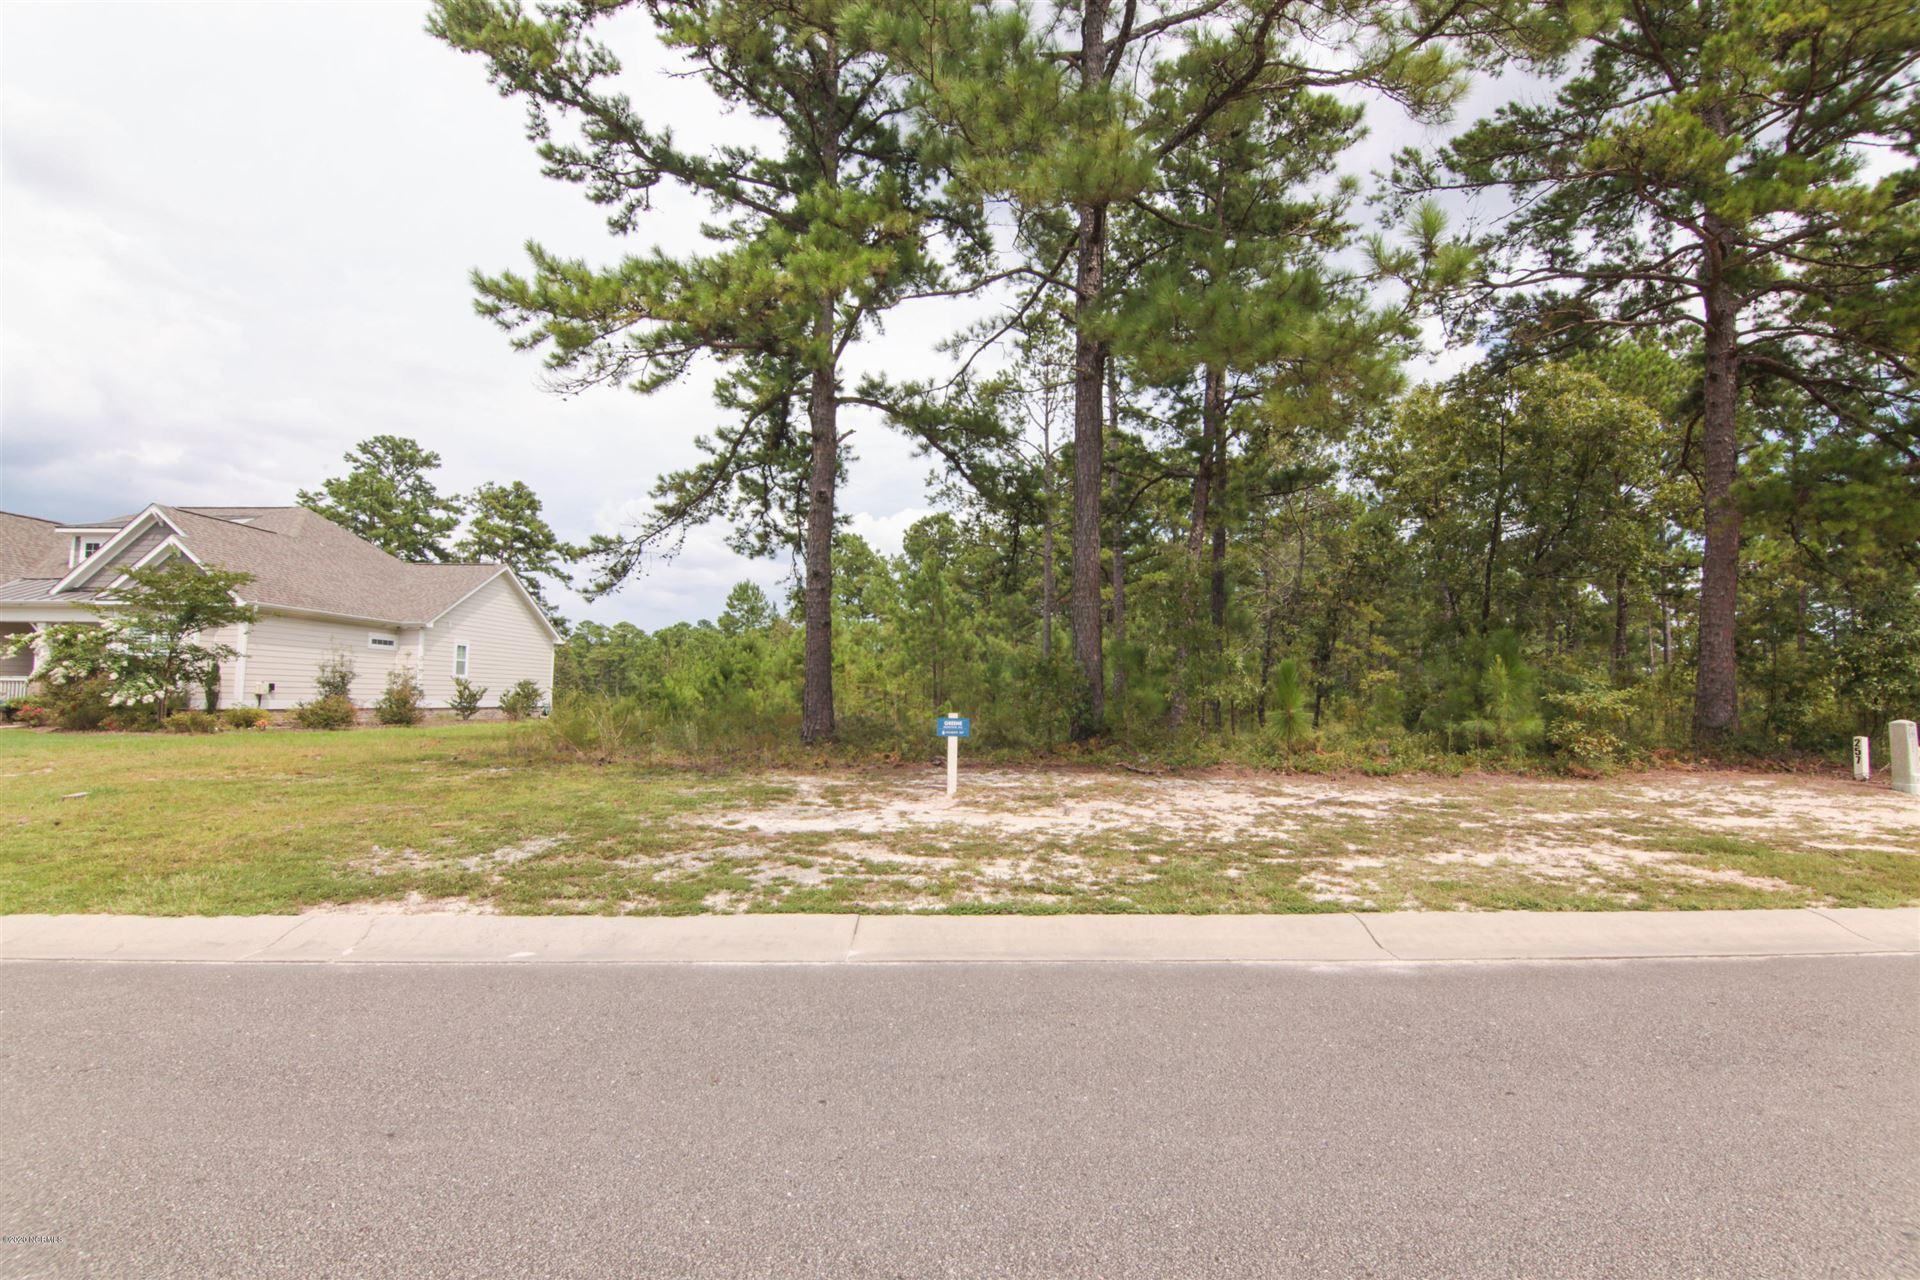 Photo of 9393 Fallen Pear Lane NE, Leland, NC 28451 (MLS # 100295148)